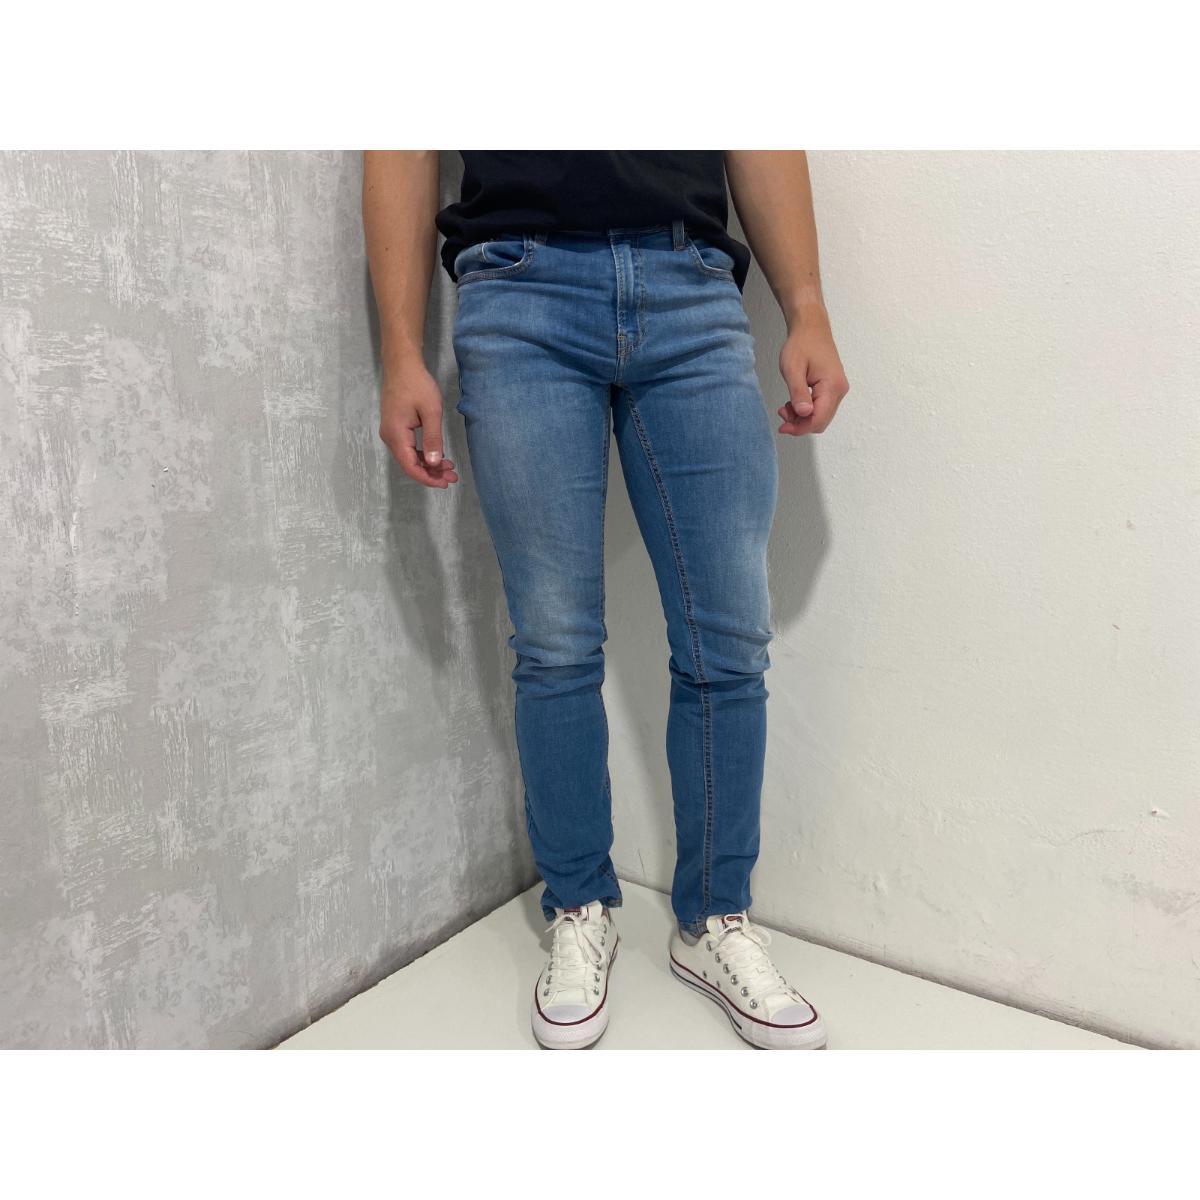 Calça Masculina Calvin Klein Ckjm01 Azul Claro